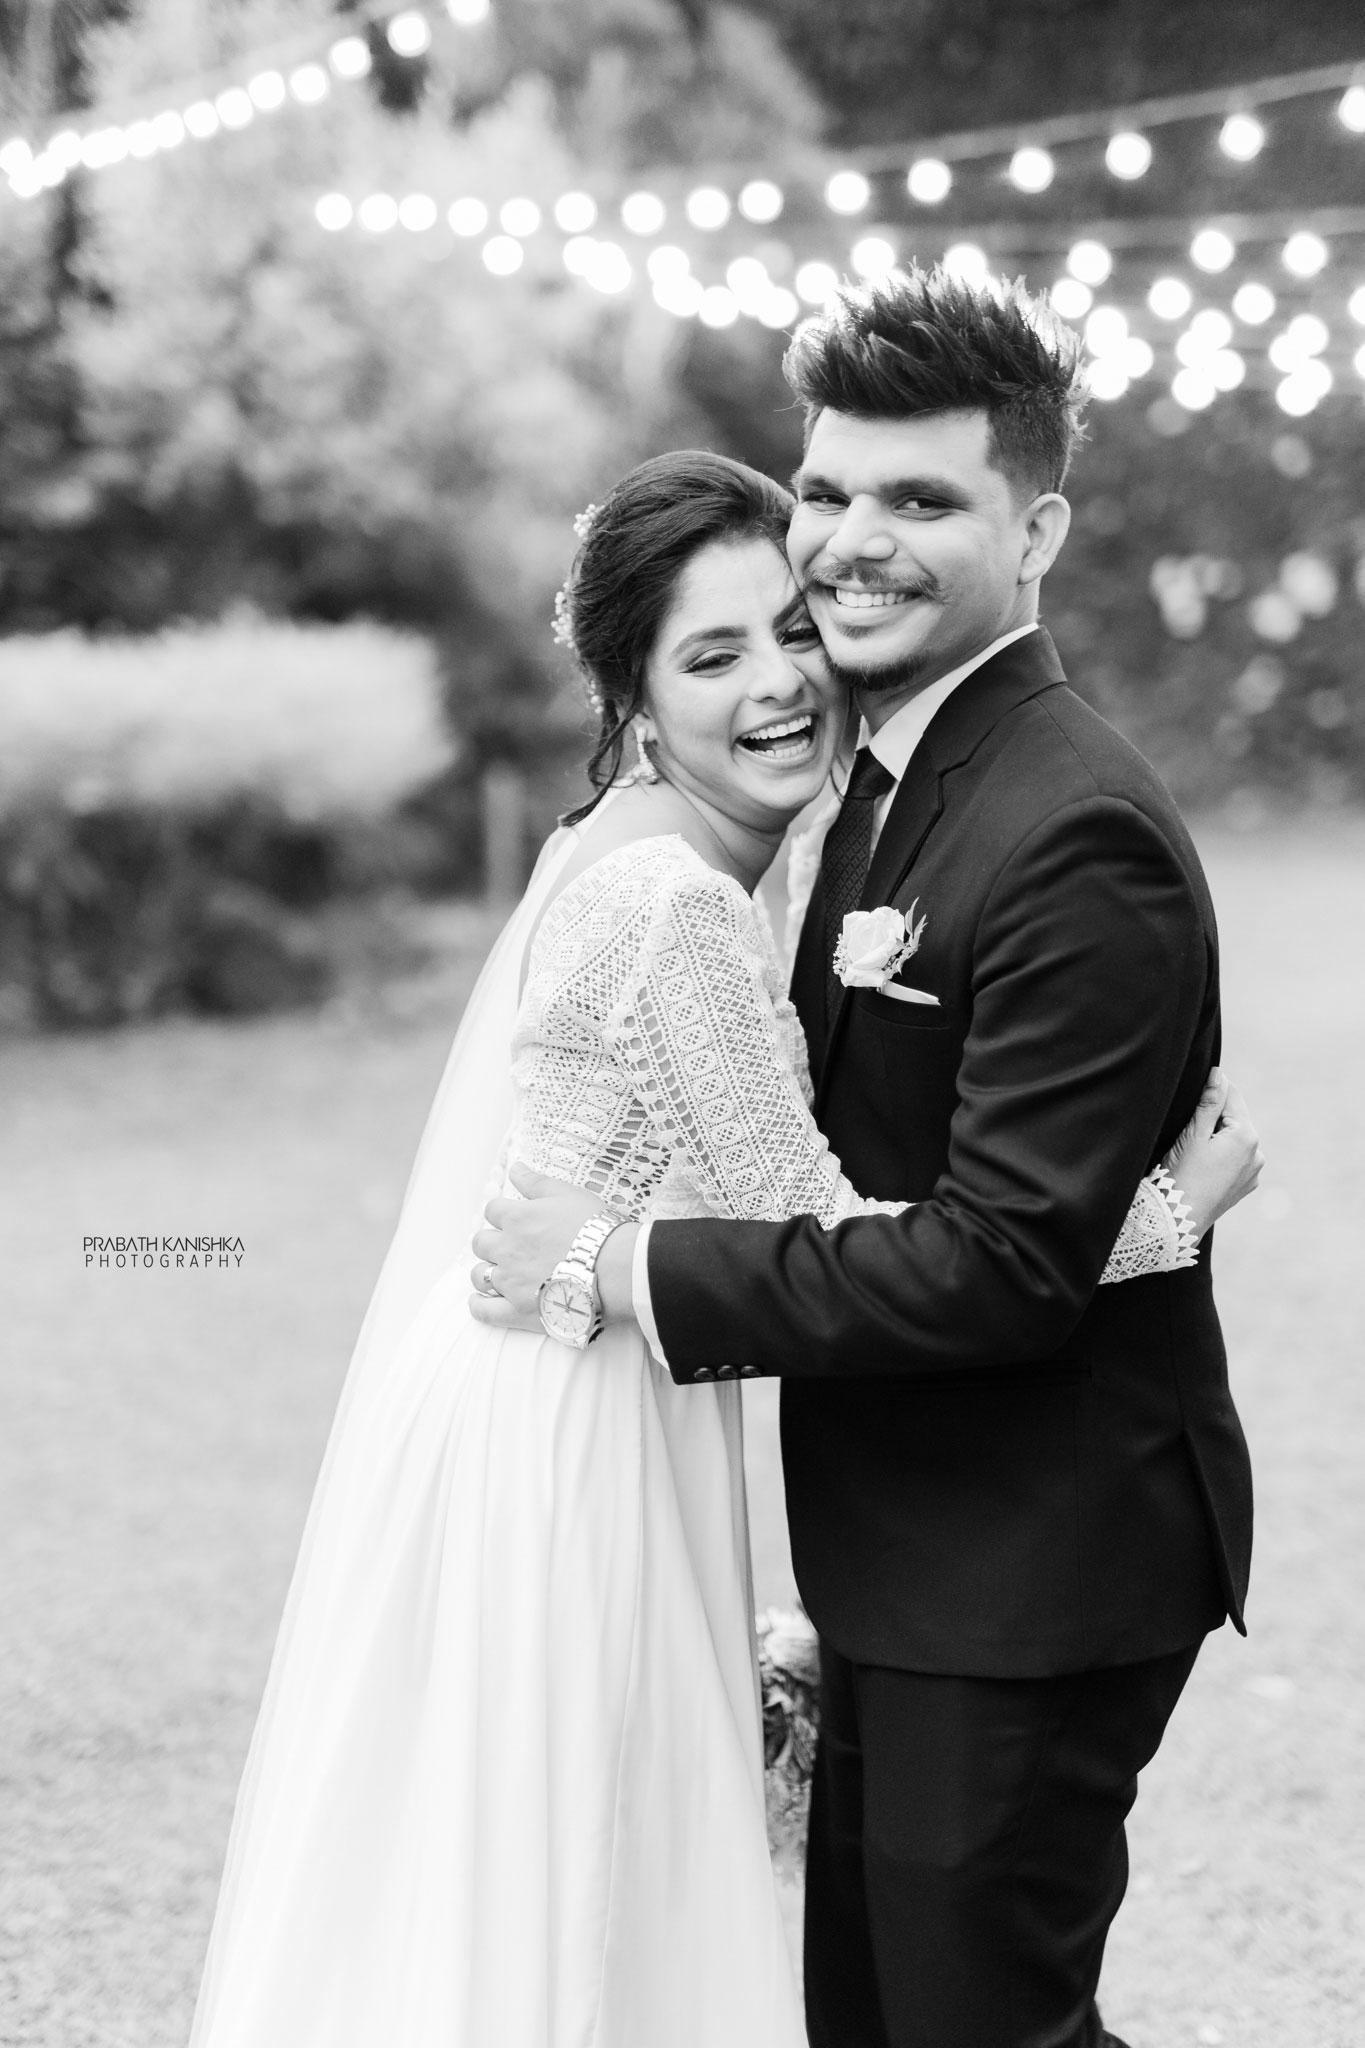 Aneeka & Stephan - Prabath Kanishka Wedding Photography